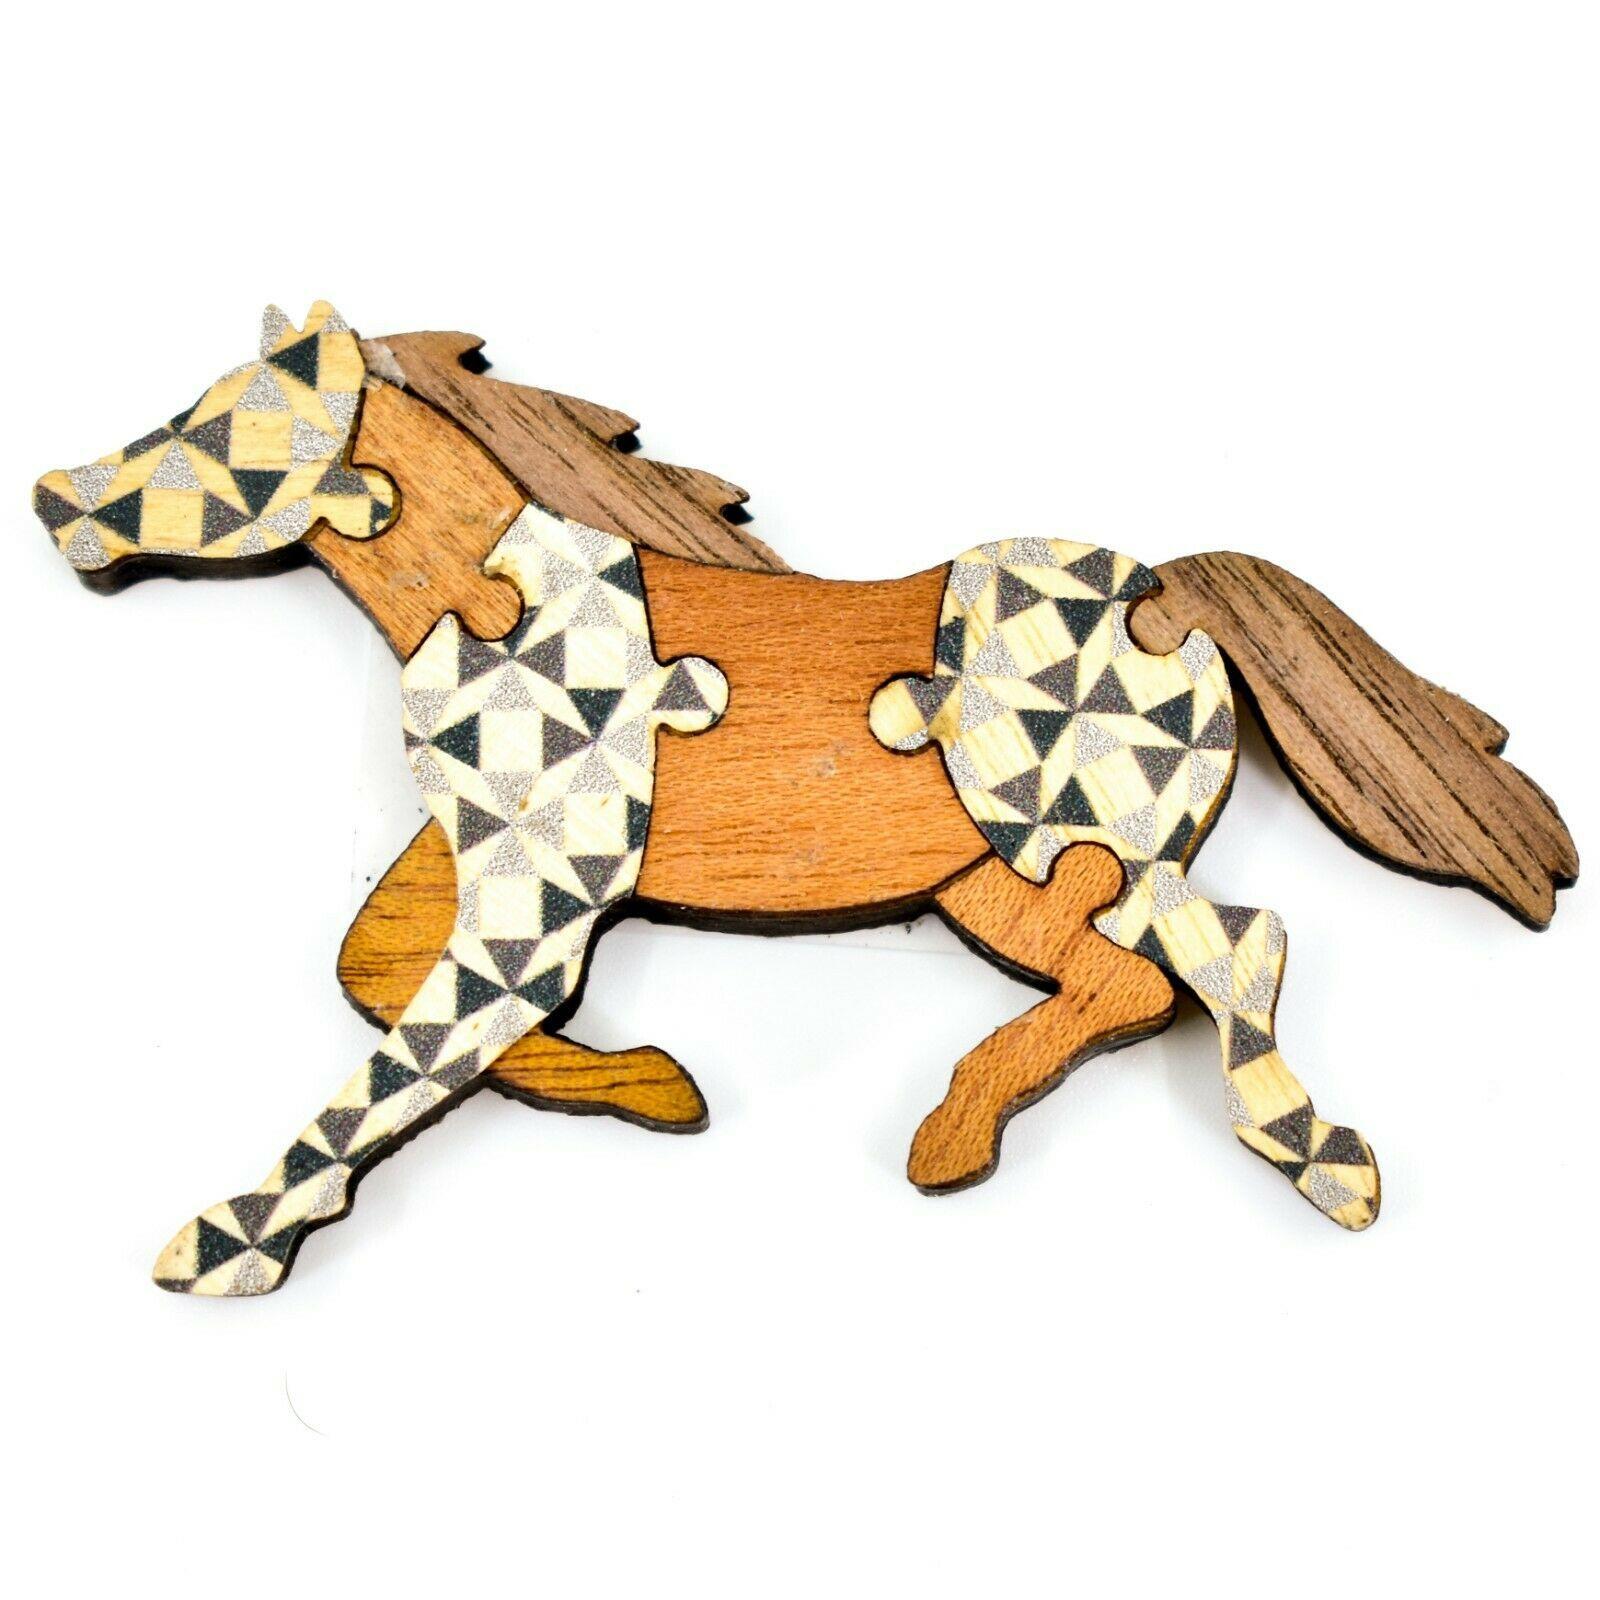 Northwoods Wood Cutout Running Horse Jigsaw Puzzle Design Magnet